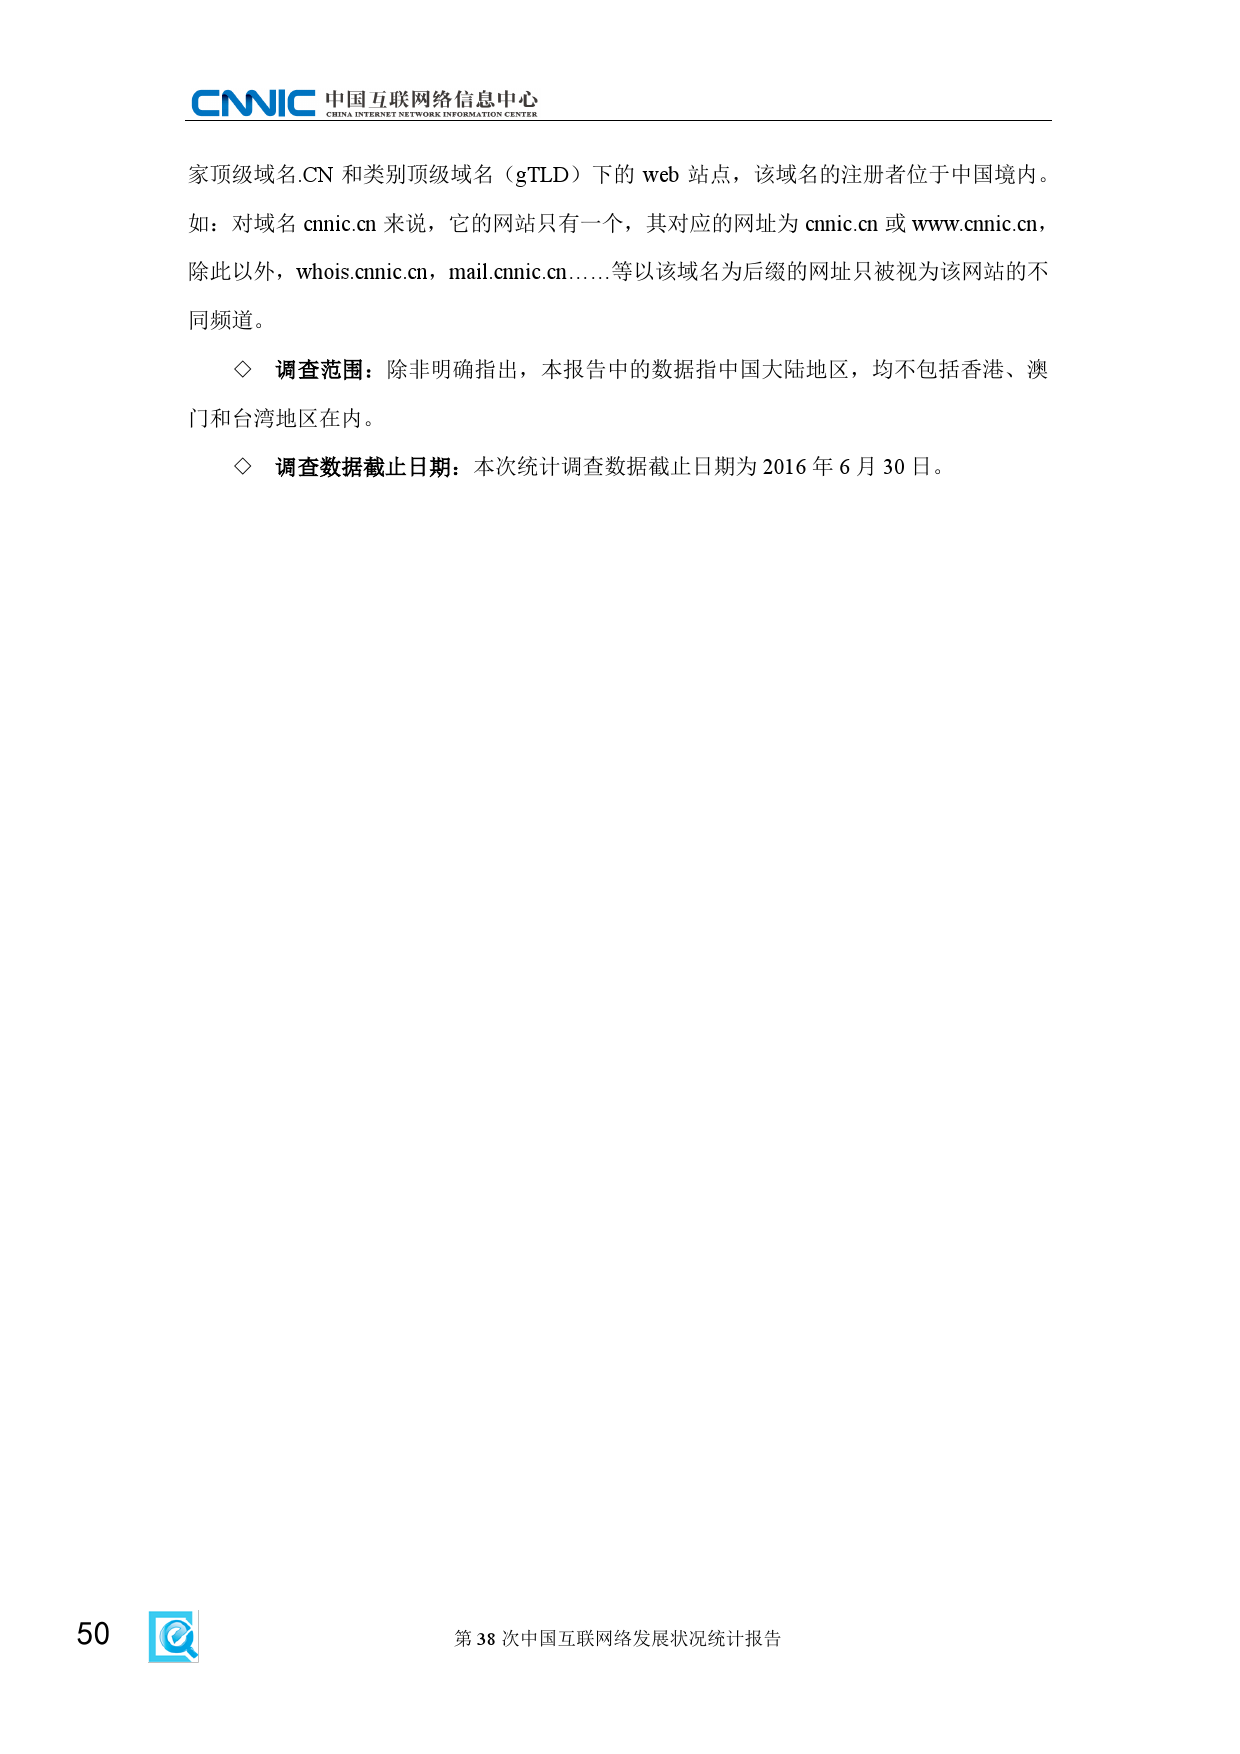 CNNIC:2015年第38次中国互联网络发展状况统计报告_000056